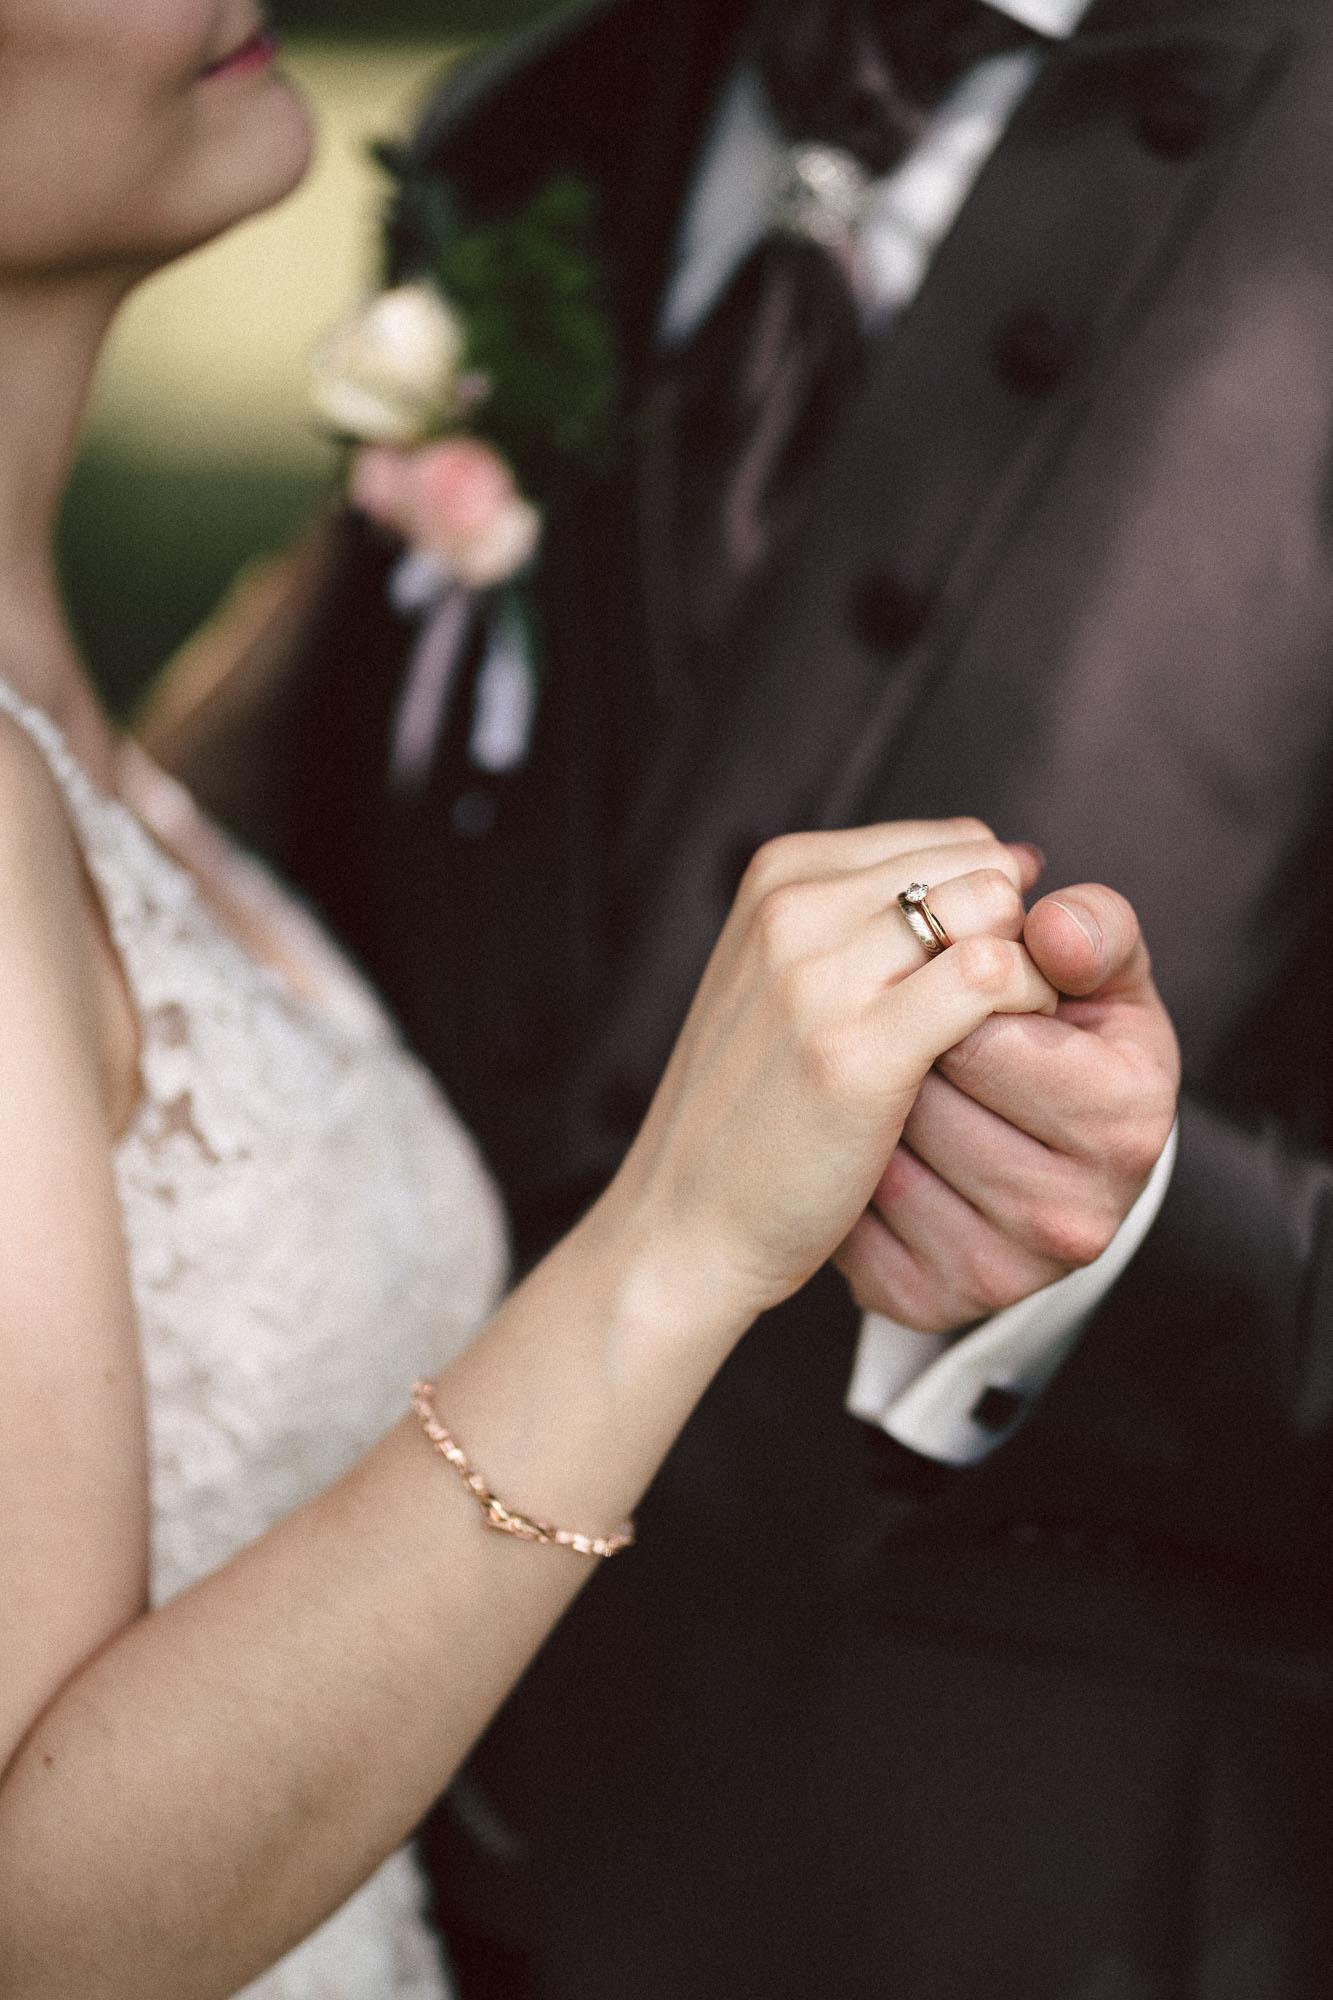 Heiraten in Augsburg Ehering Brautpaarshooting